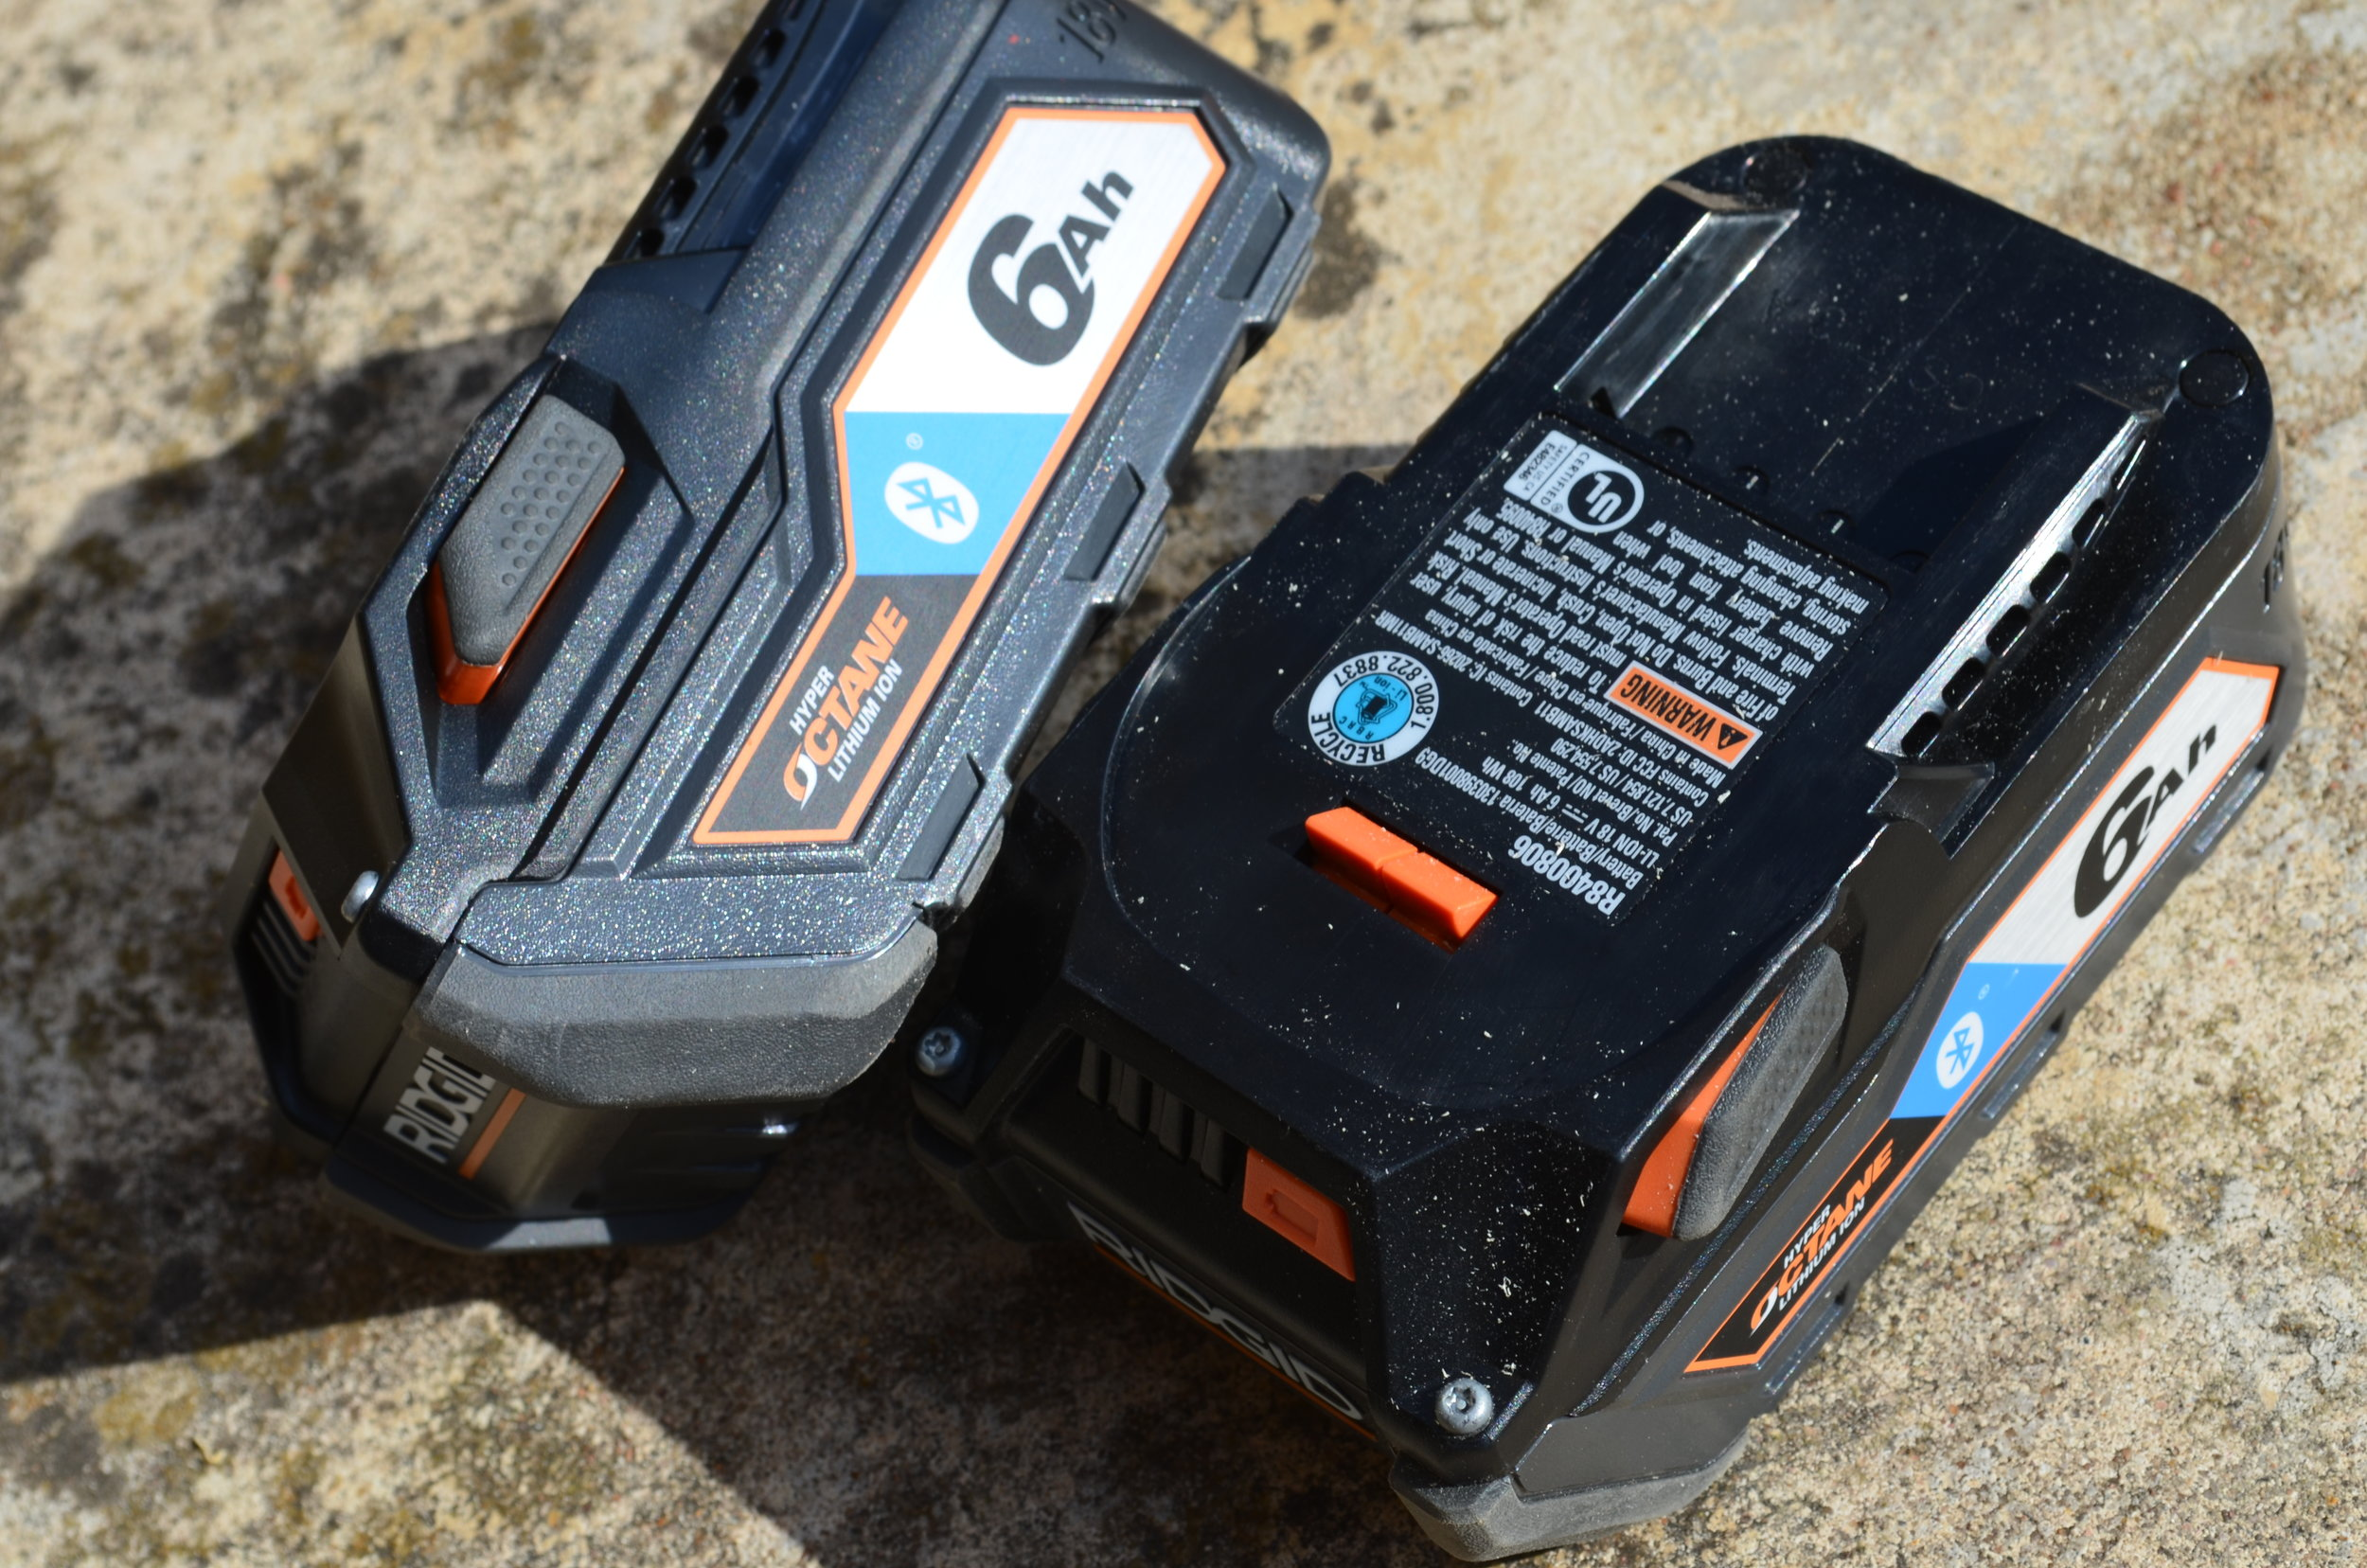 ridgid-6ah-18v-lithium-ion-bluetooth-octane-batteries